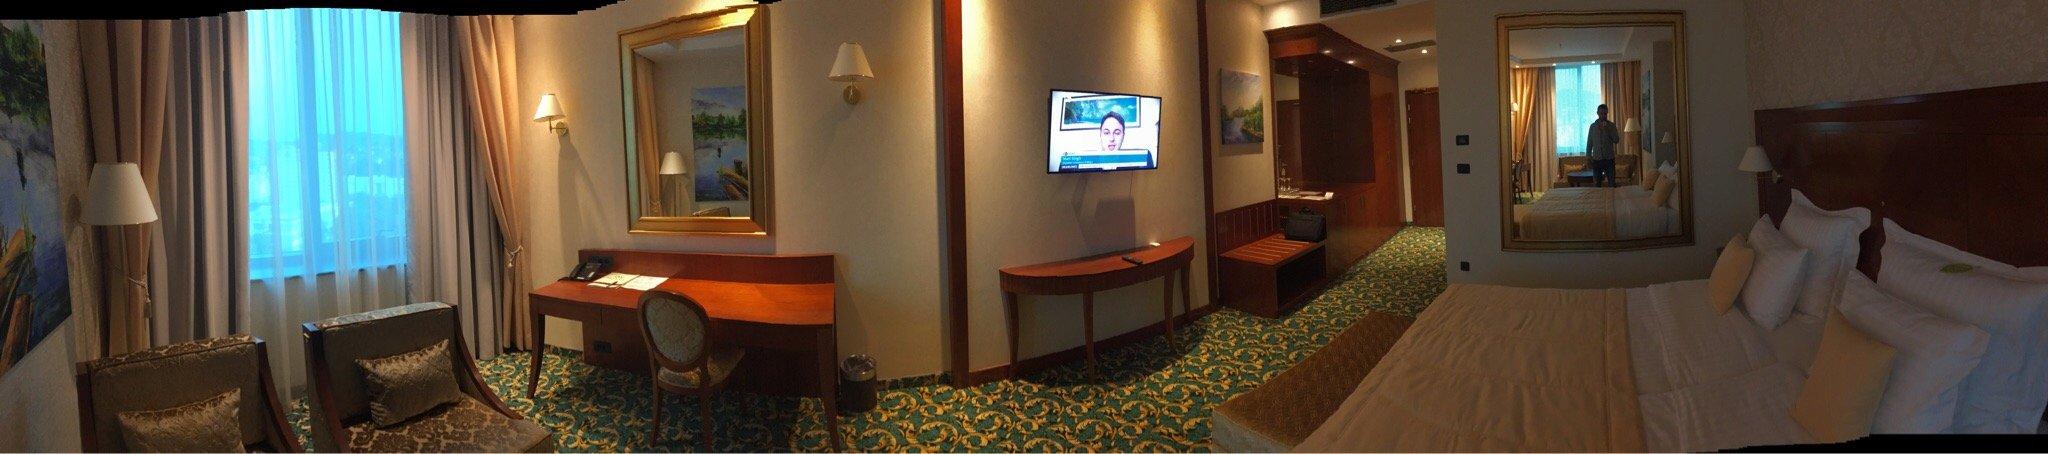 Mellain Hotel